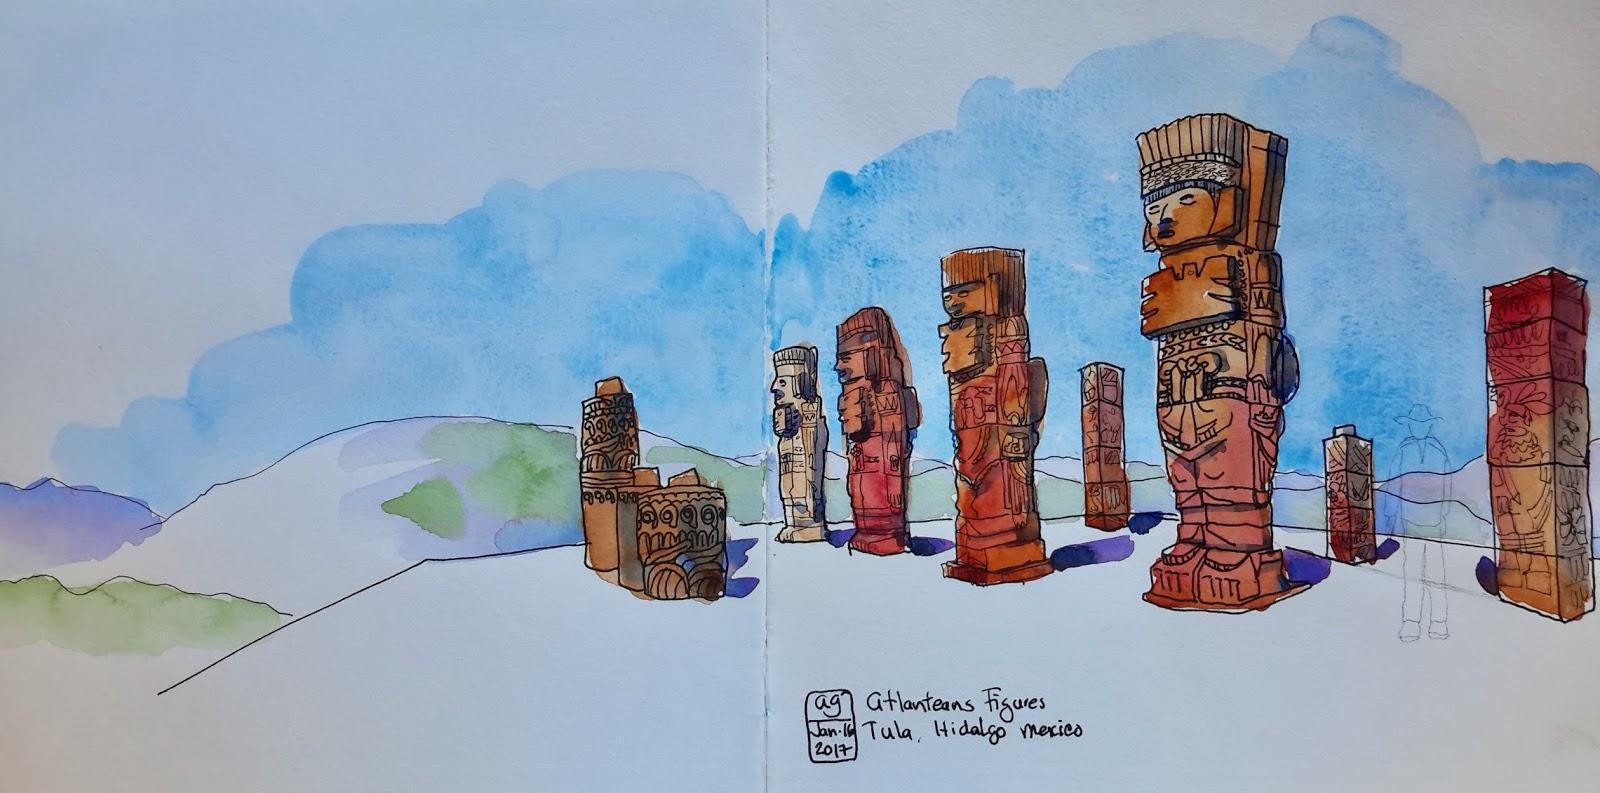 Adriana Sketches Hidalgo Part 16 Atlanteans Figures Of Tula